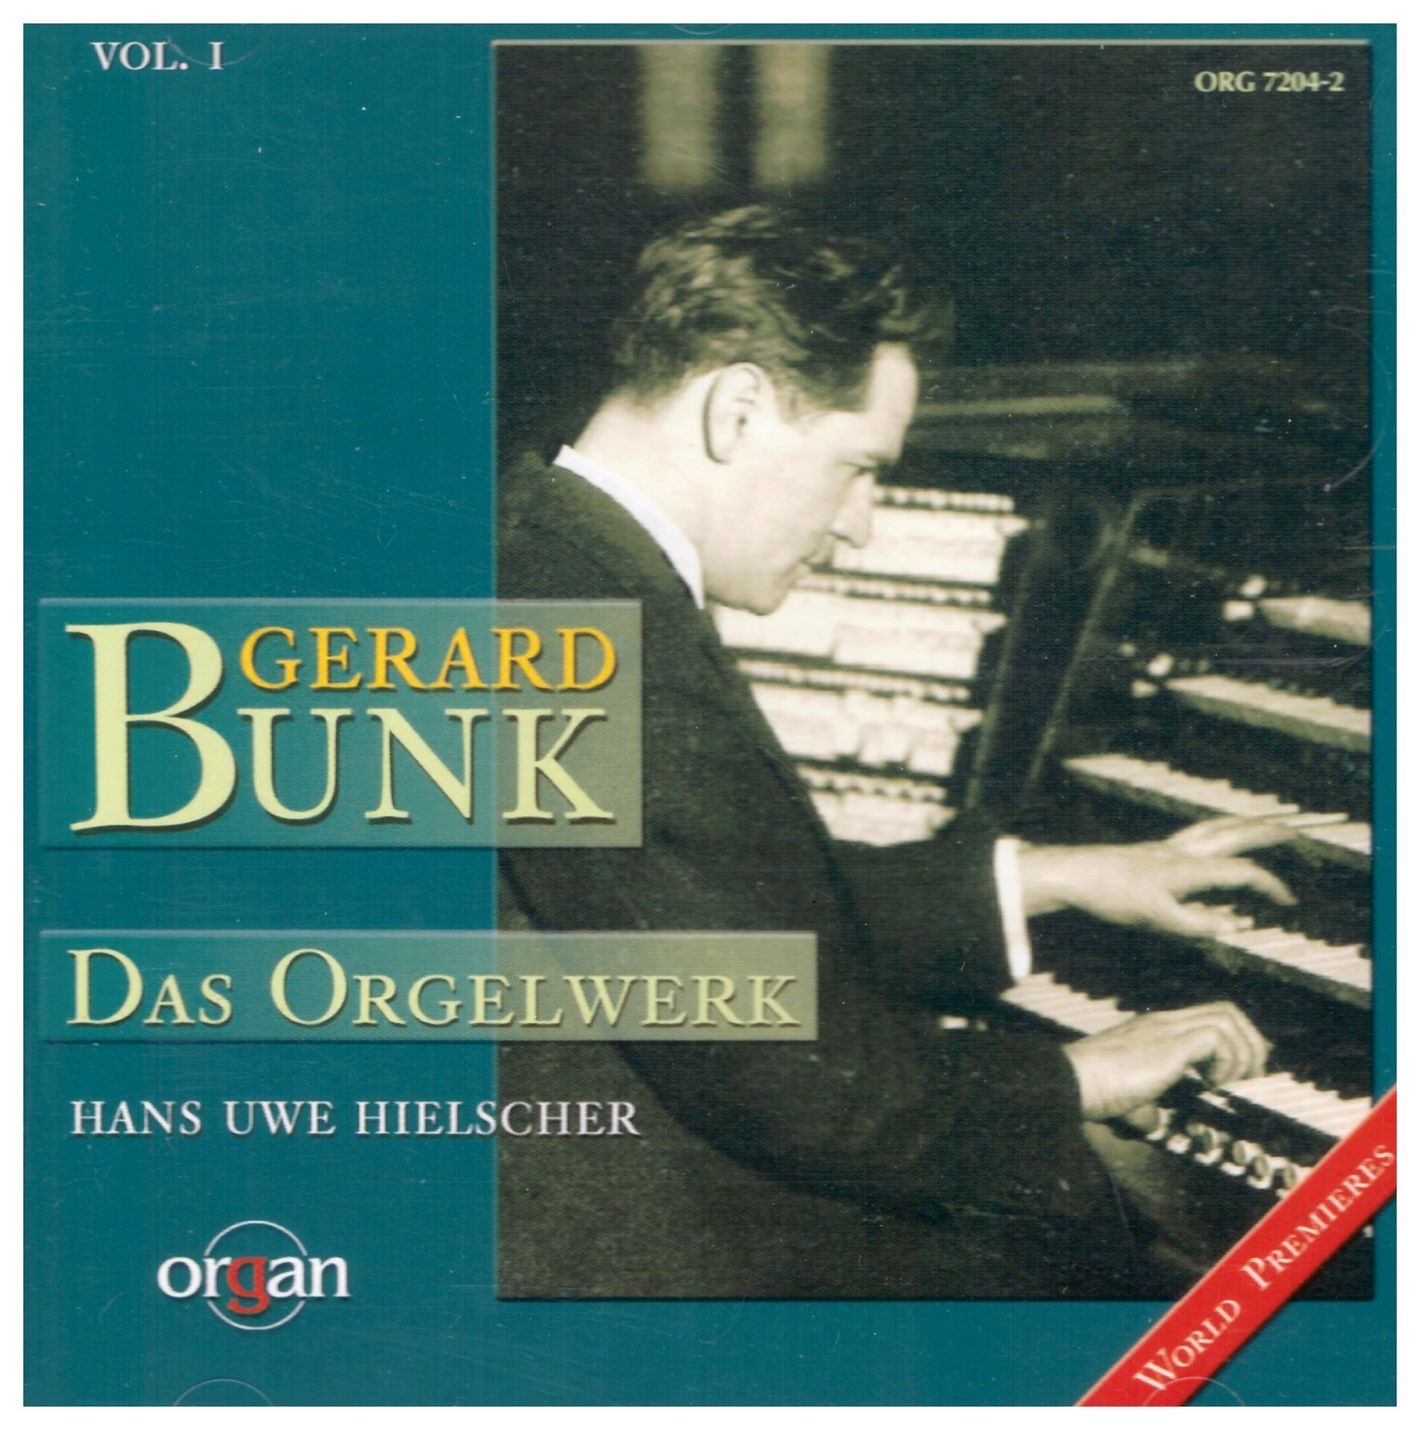 Gerard Bunk: Free Organ Works I